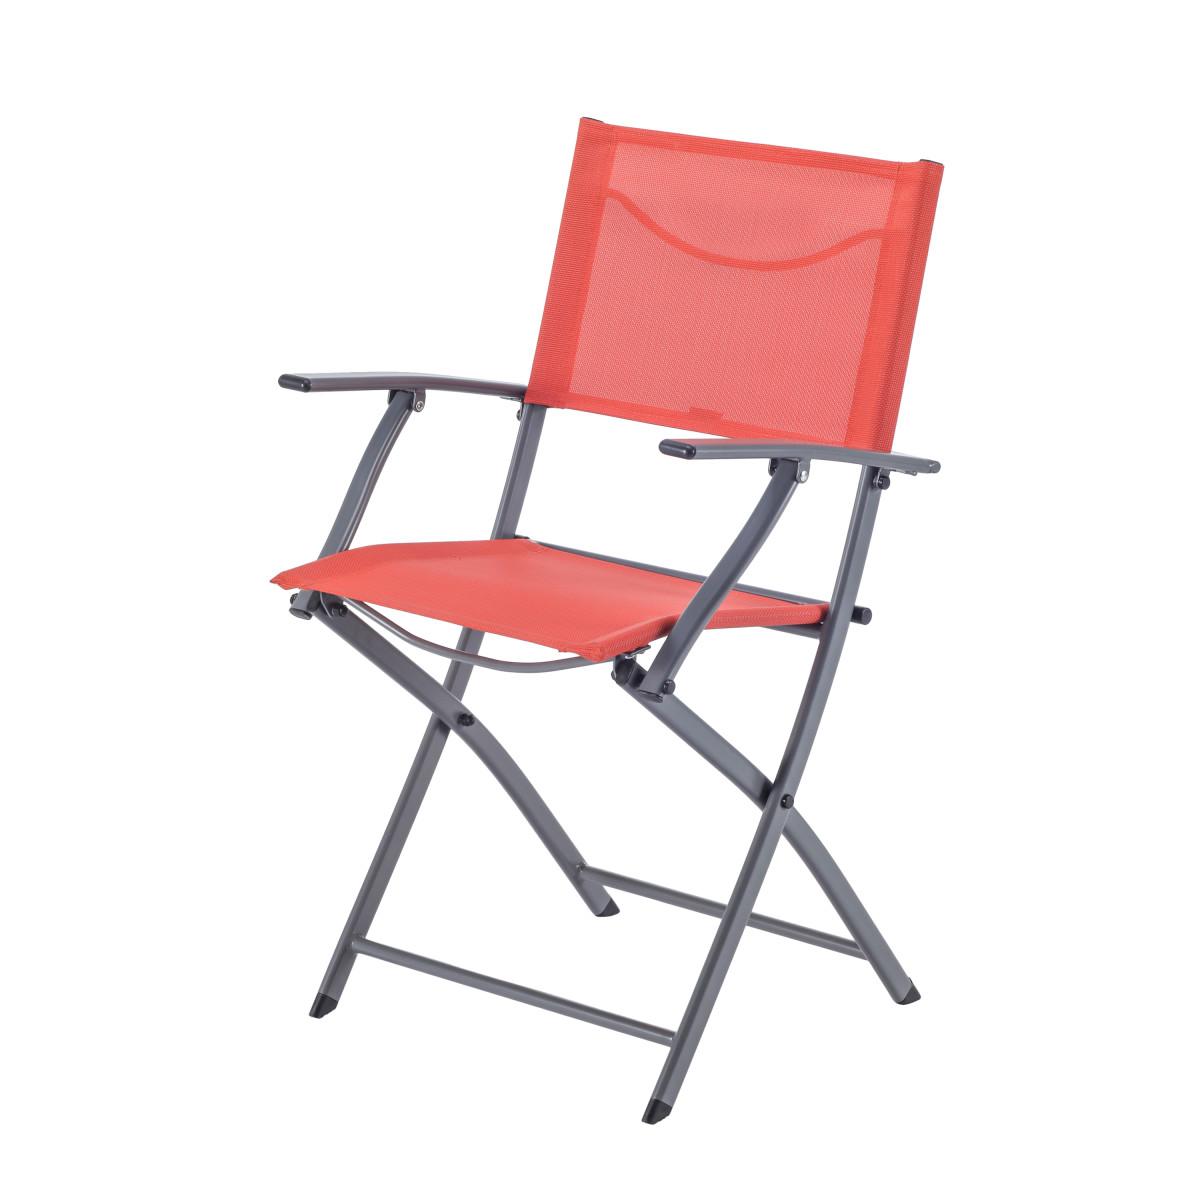 Кресло Naterial Emys Origami складное 54х52х83 см сталь красный